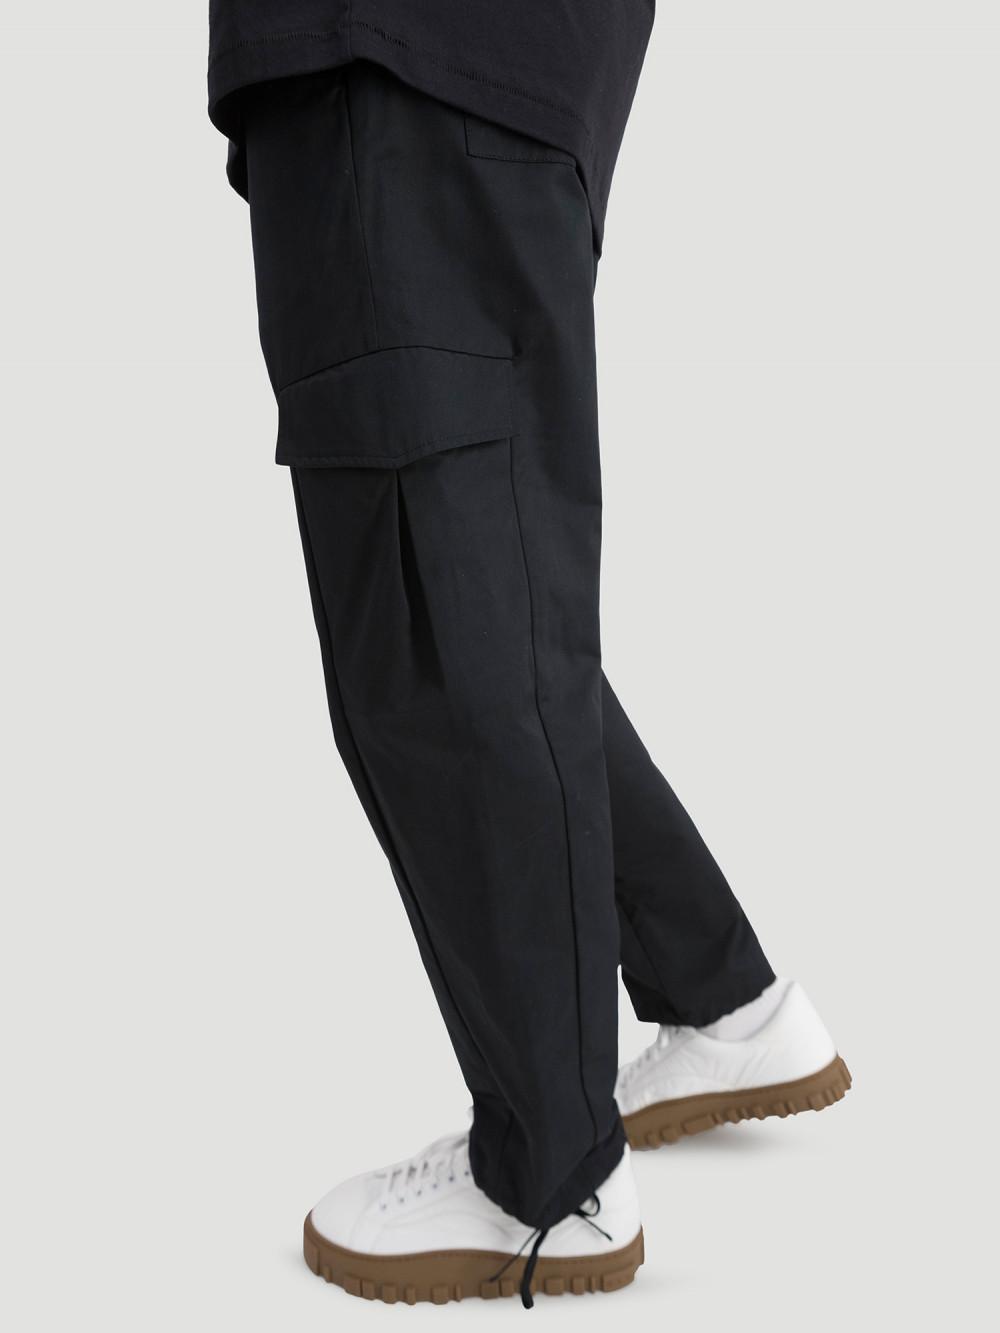 Pimp Trouser Black